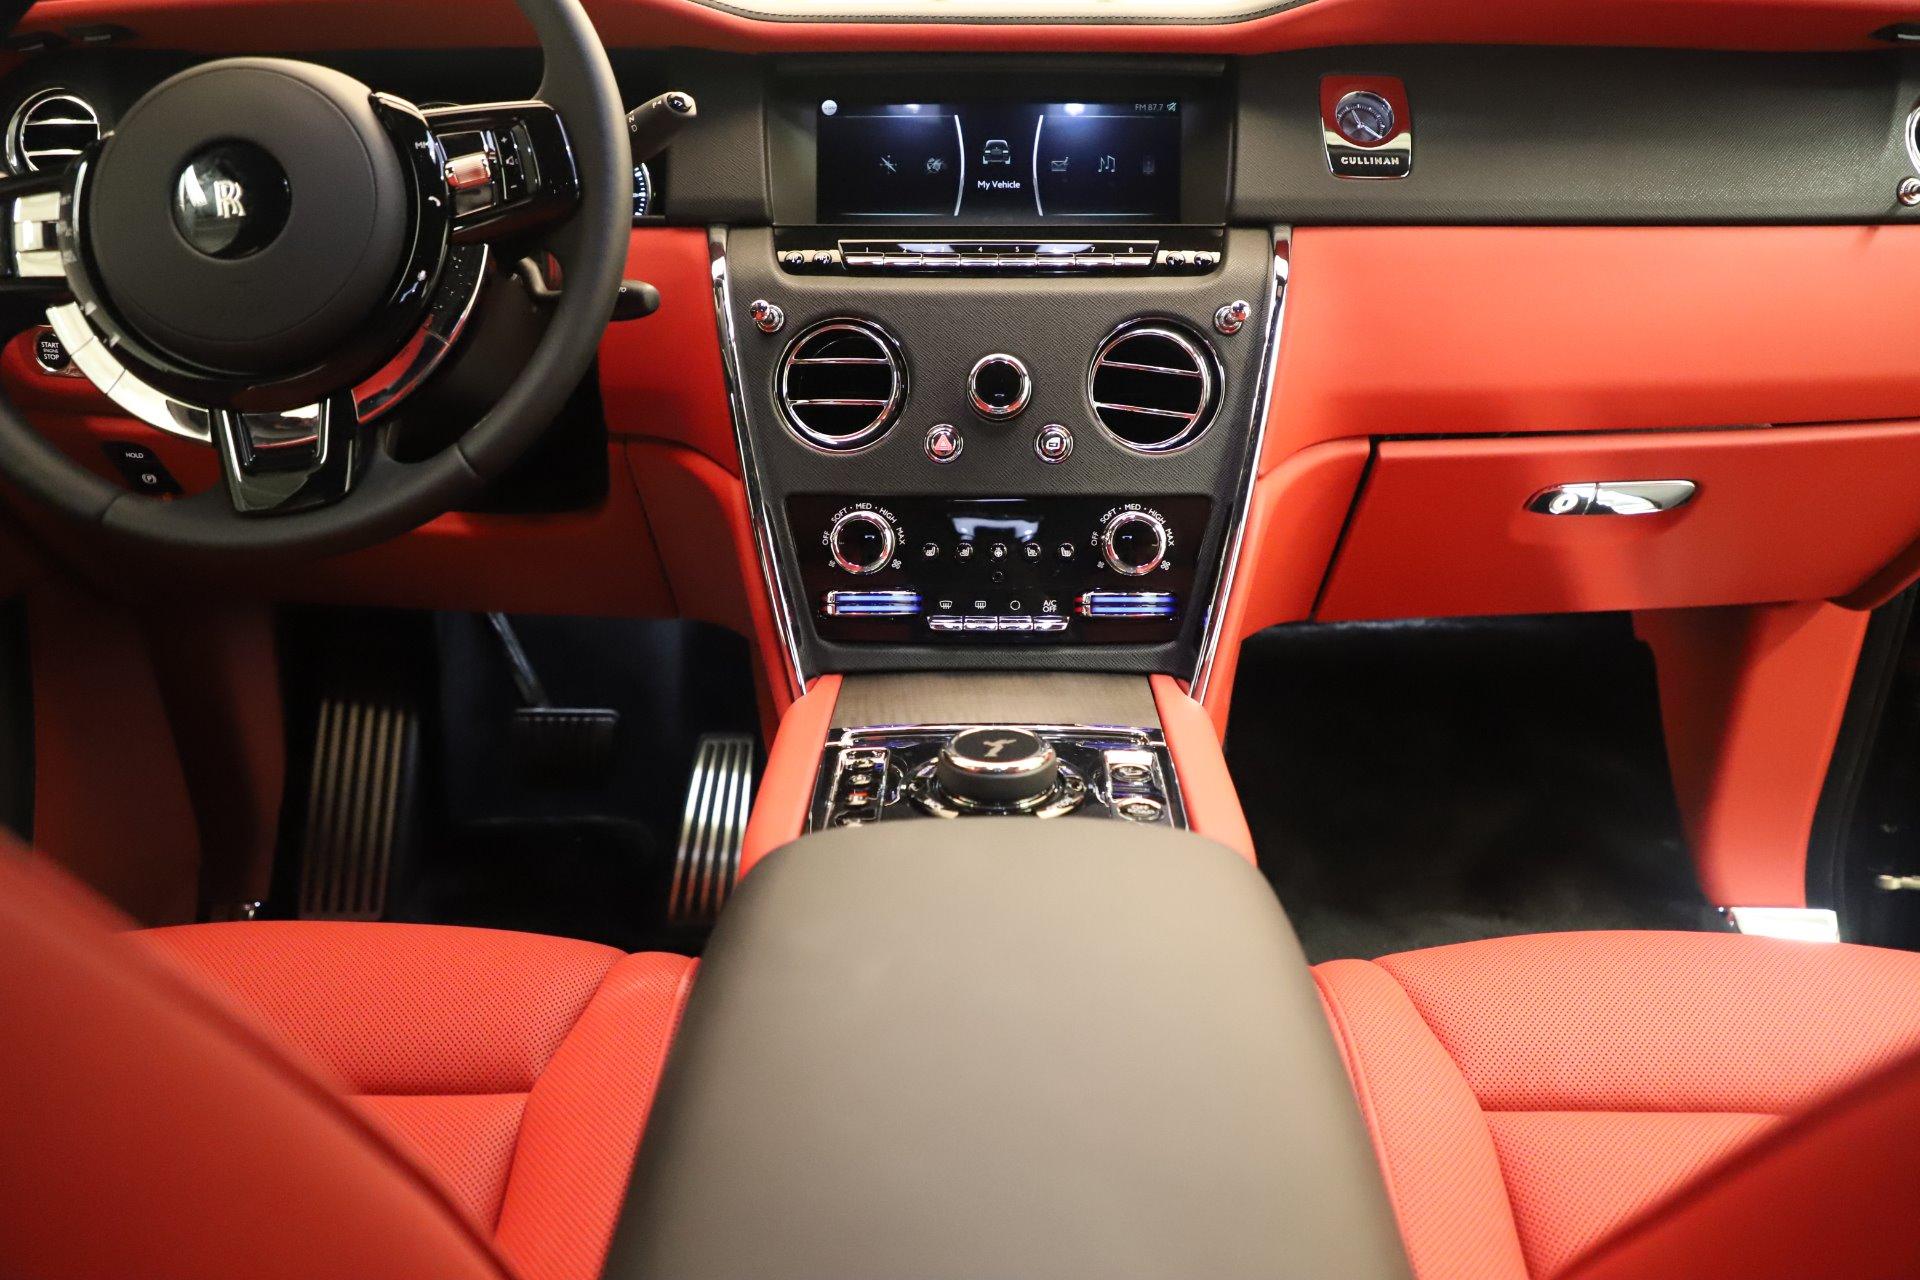 New-2020-Rolls-Royce-Cullinan